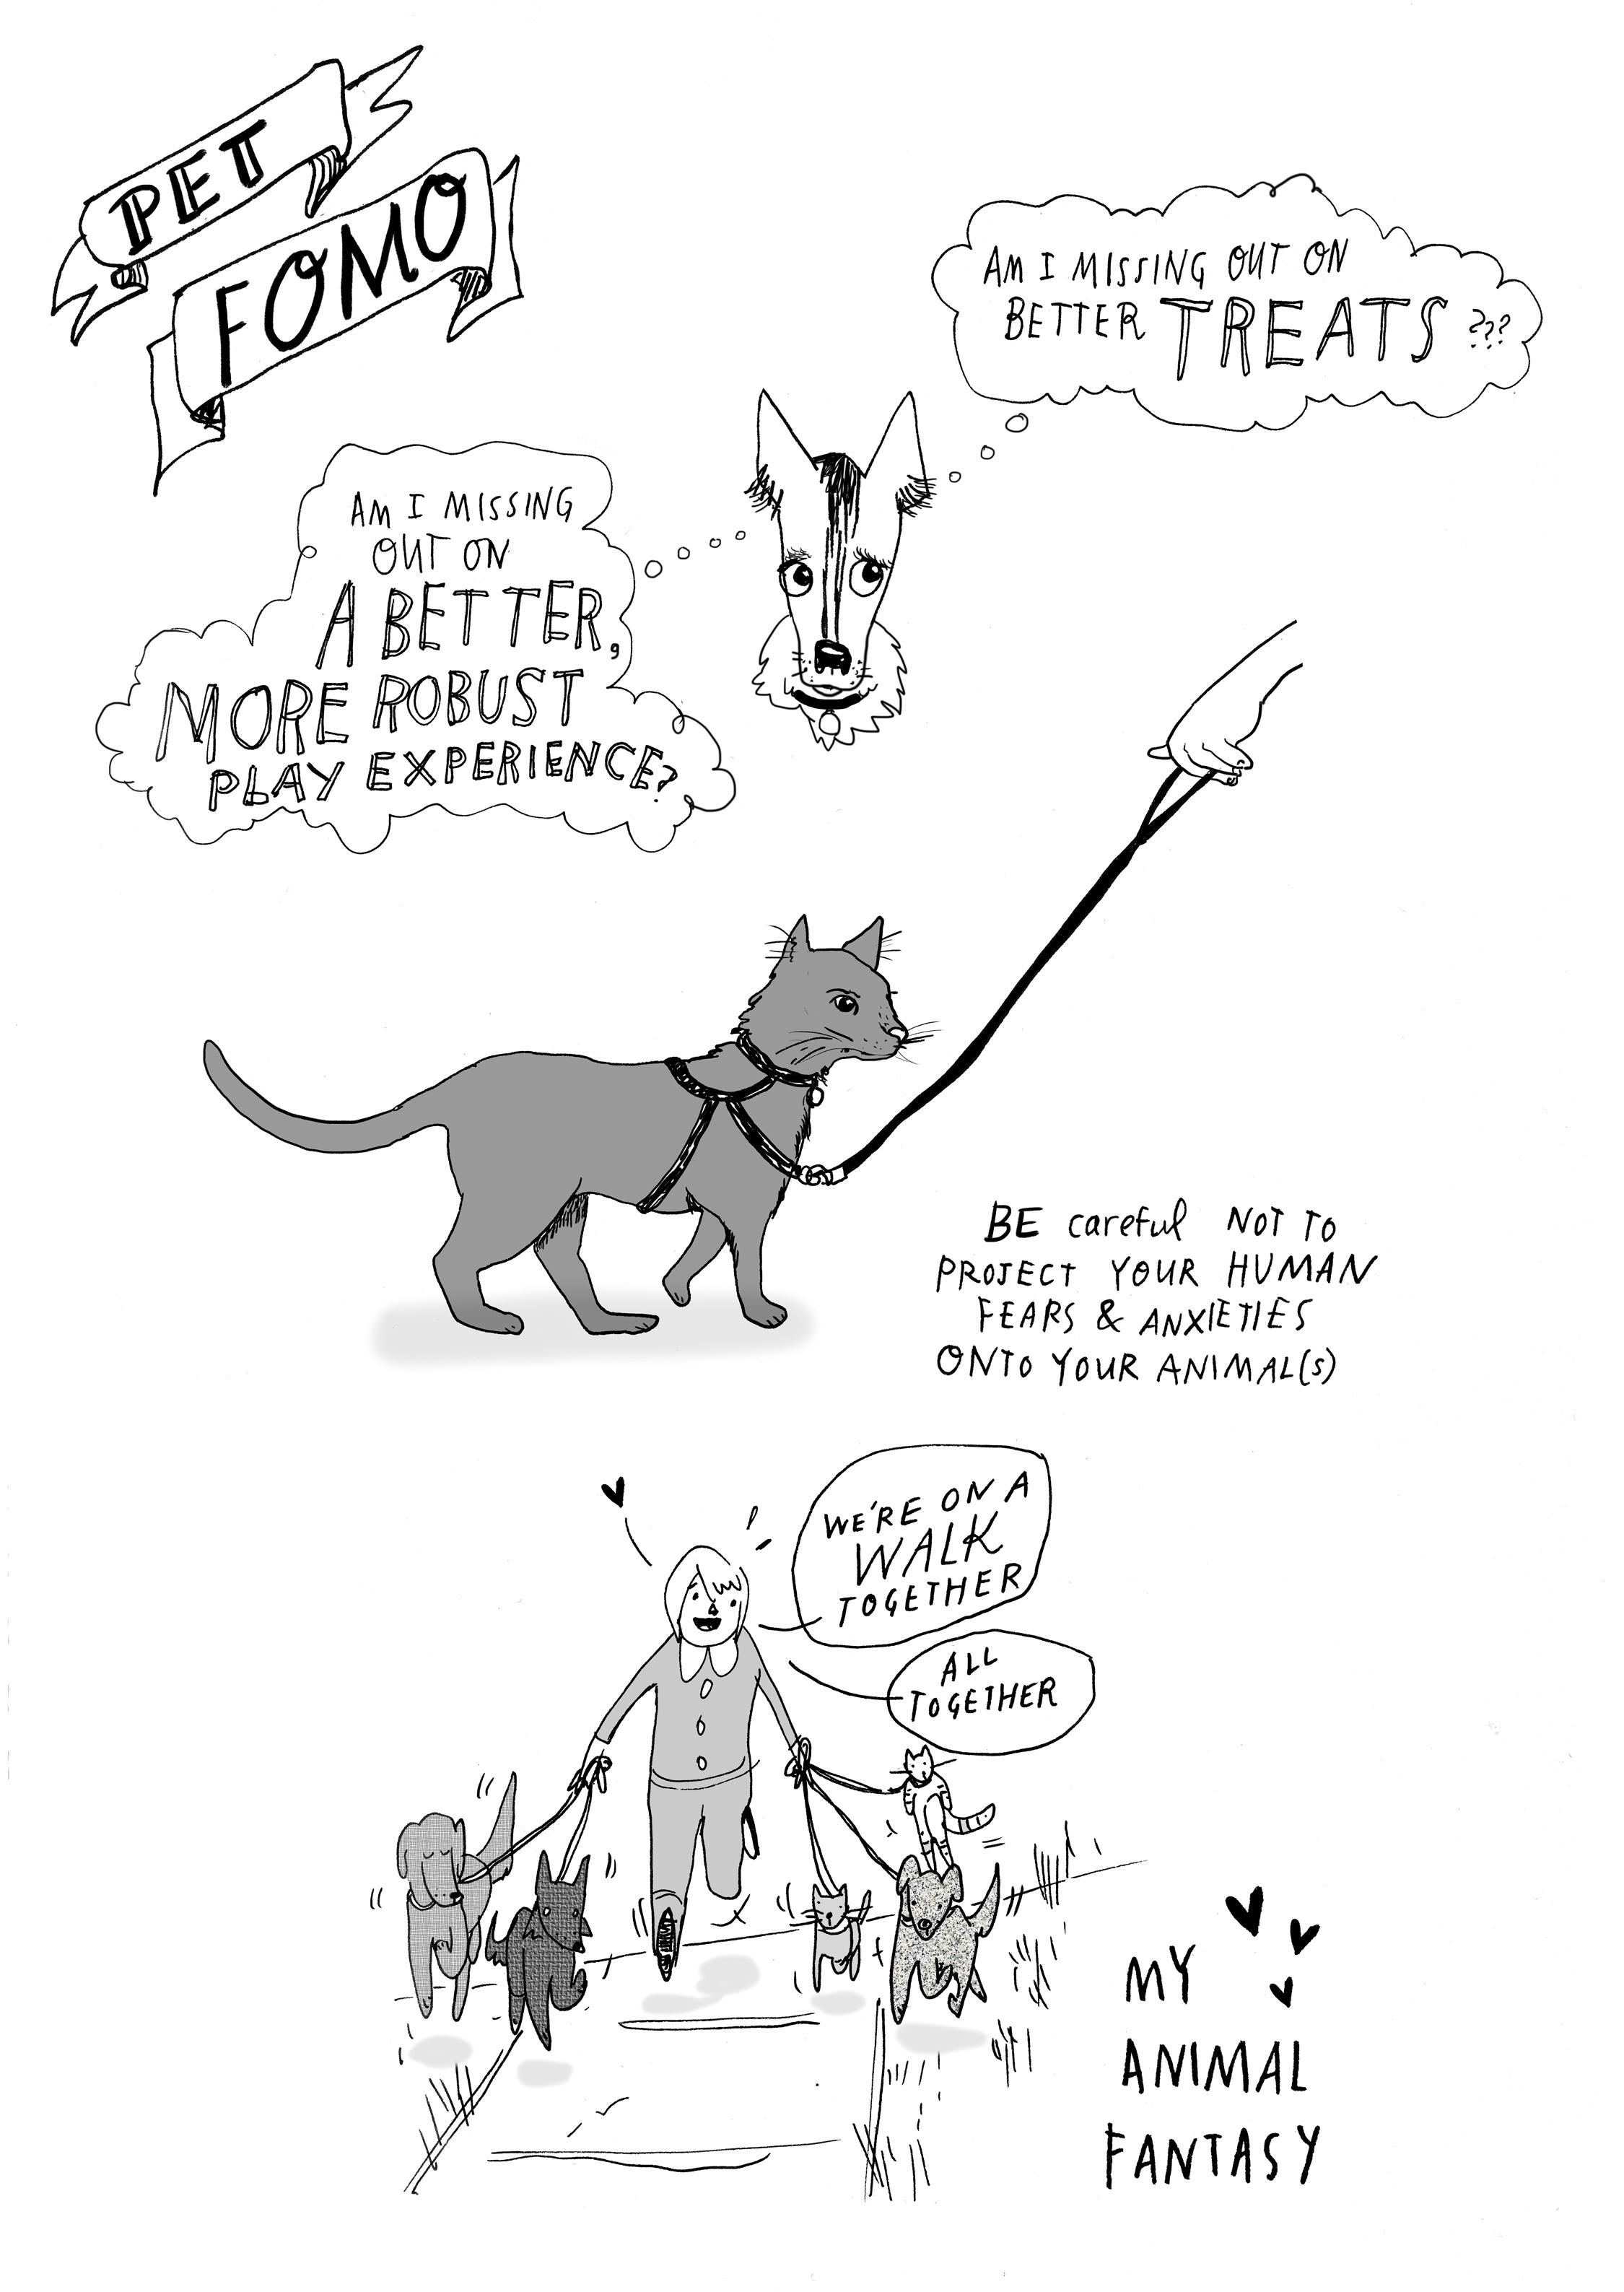 Pet Fomo , ink and digital, 2014